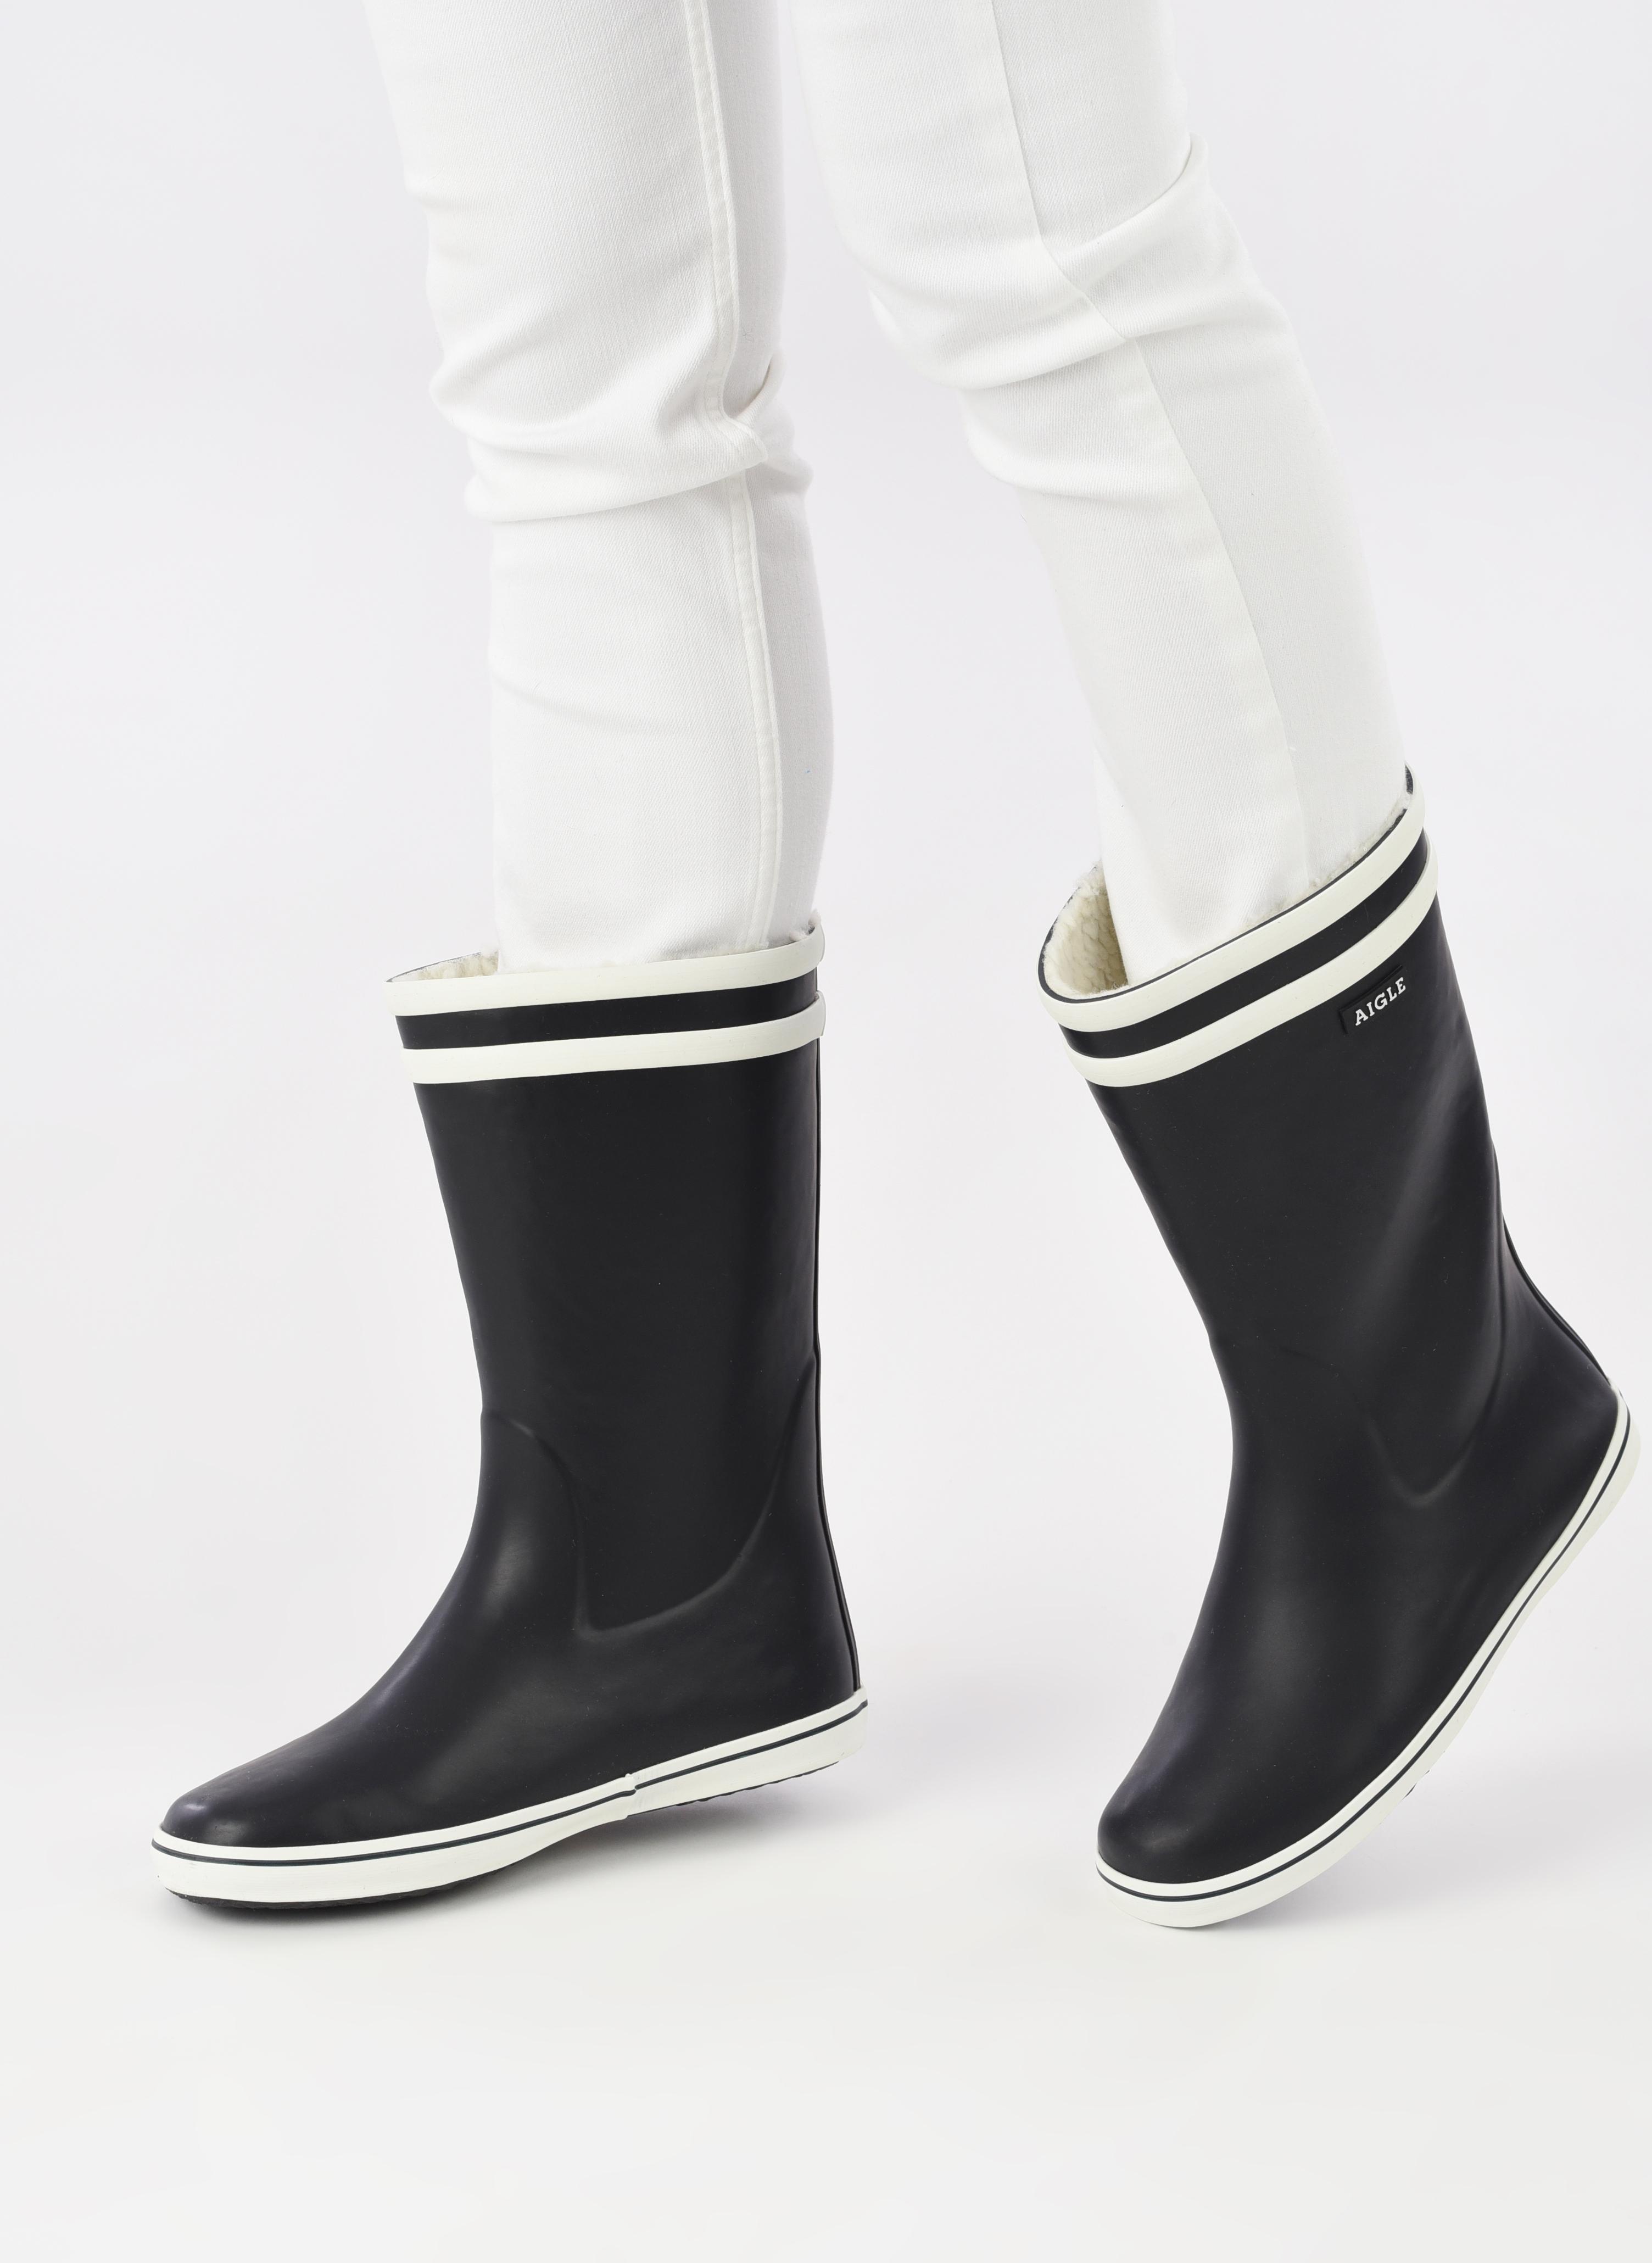 Malouine Fur Marine/blanc